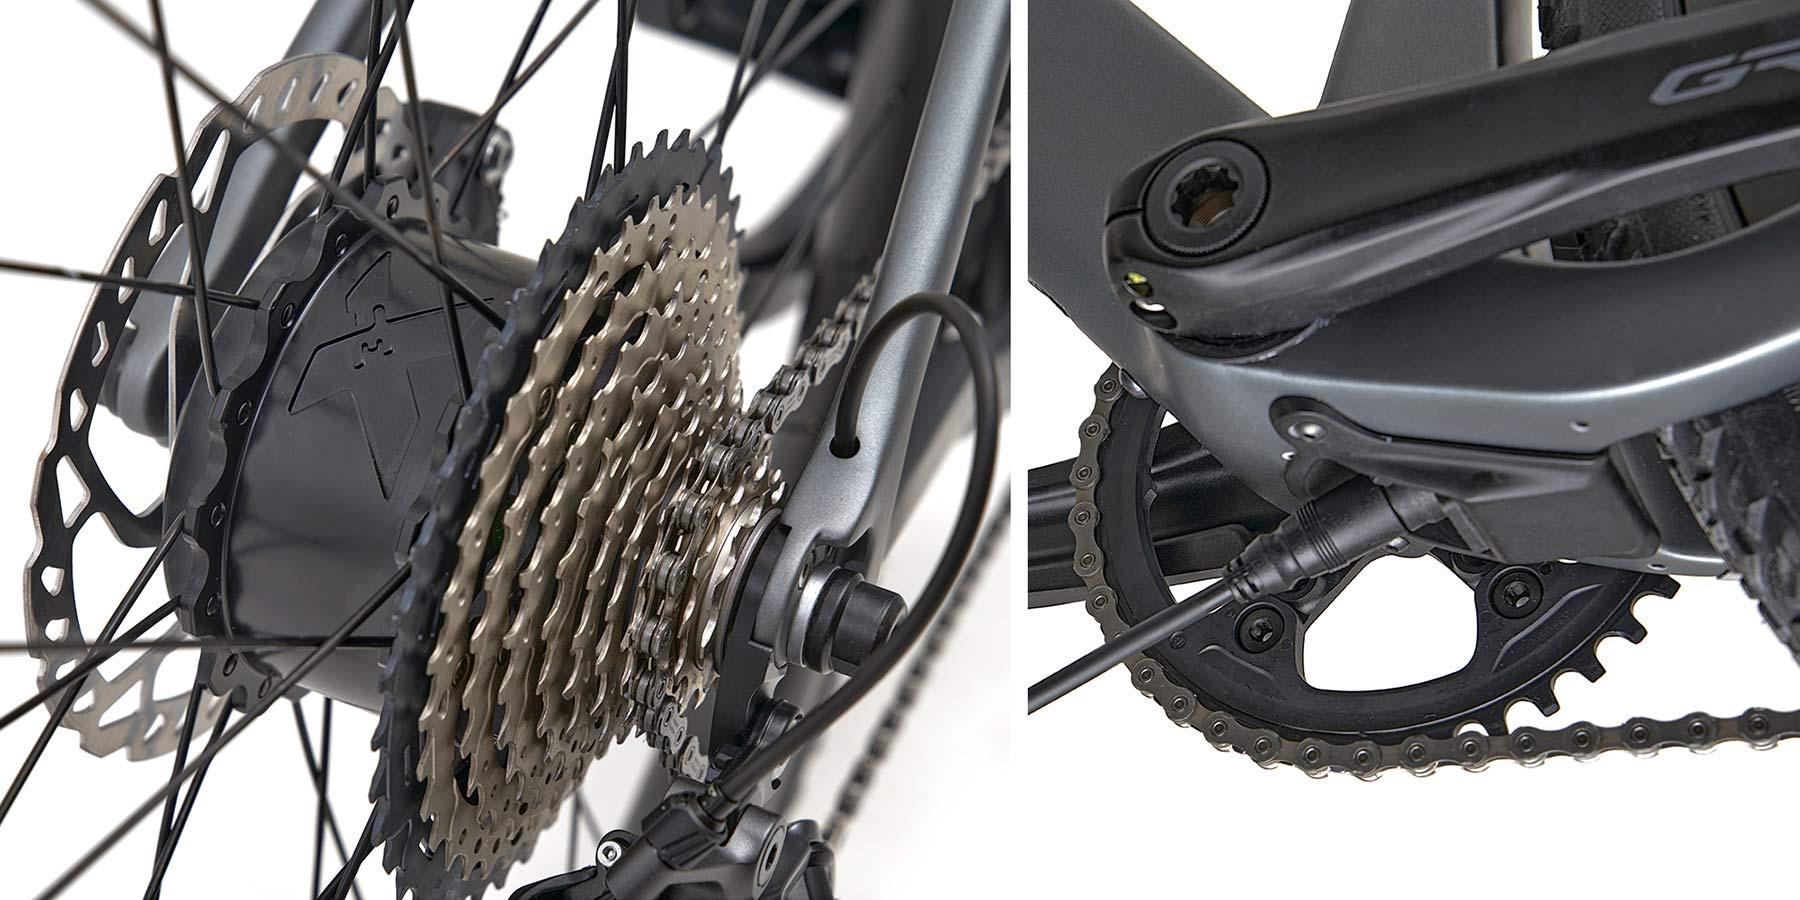 3T Exploro RaceMax Boost gravel e-bike, stealth ebikemotion X35 pedal-assist,details